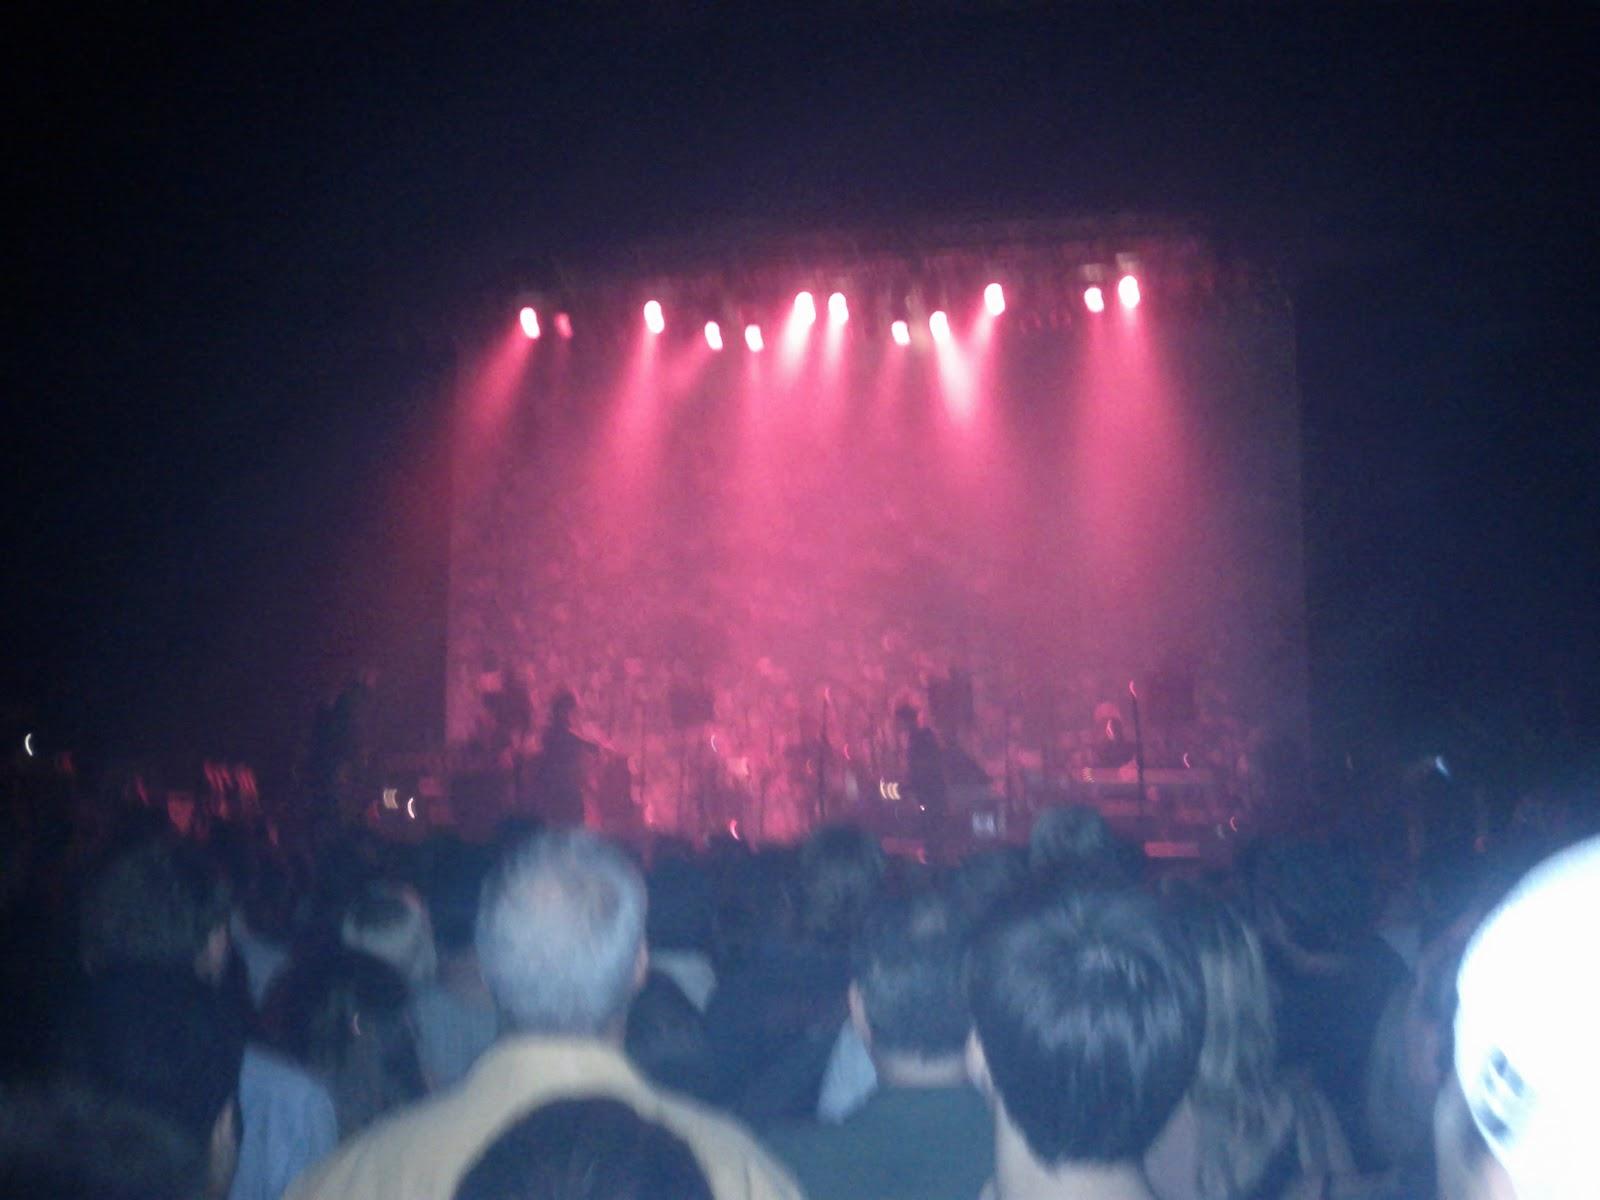 Wilco at Verizon Wireless Theater - IMG_20110506_213835.jpg